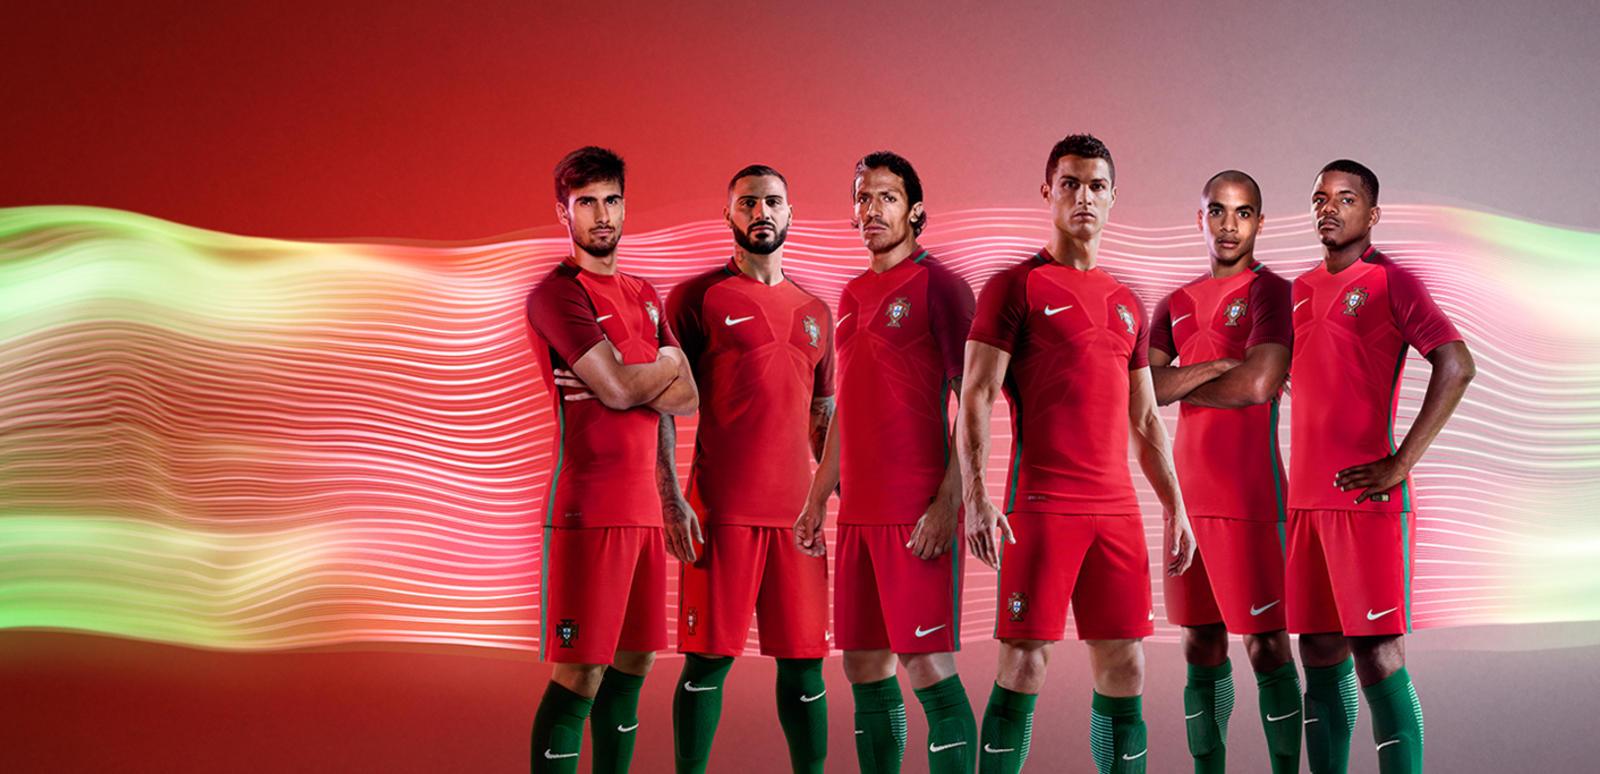 Portugal 2016 National Football Kits - Nike News